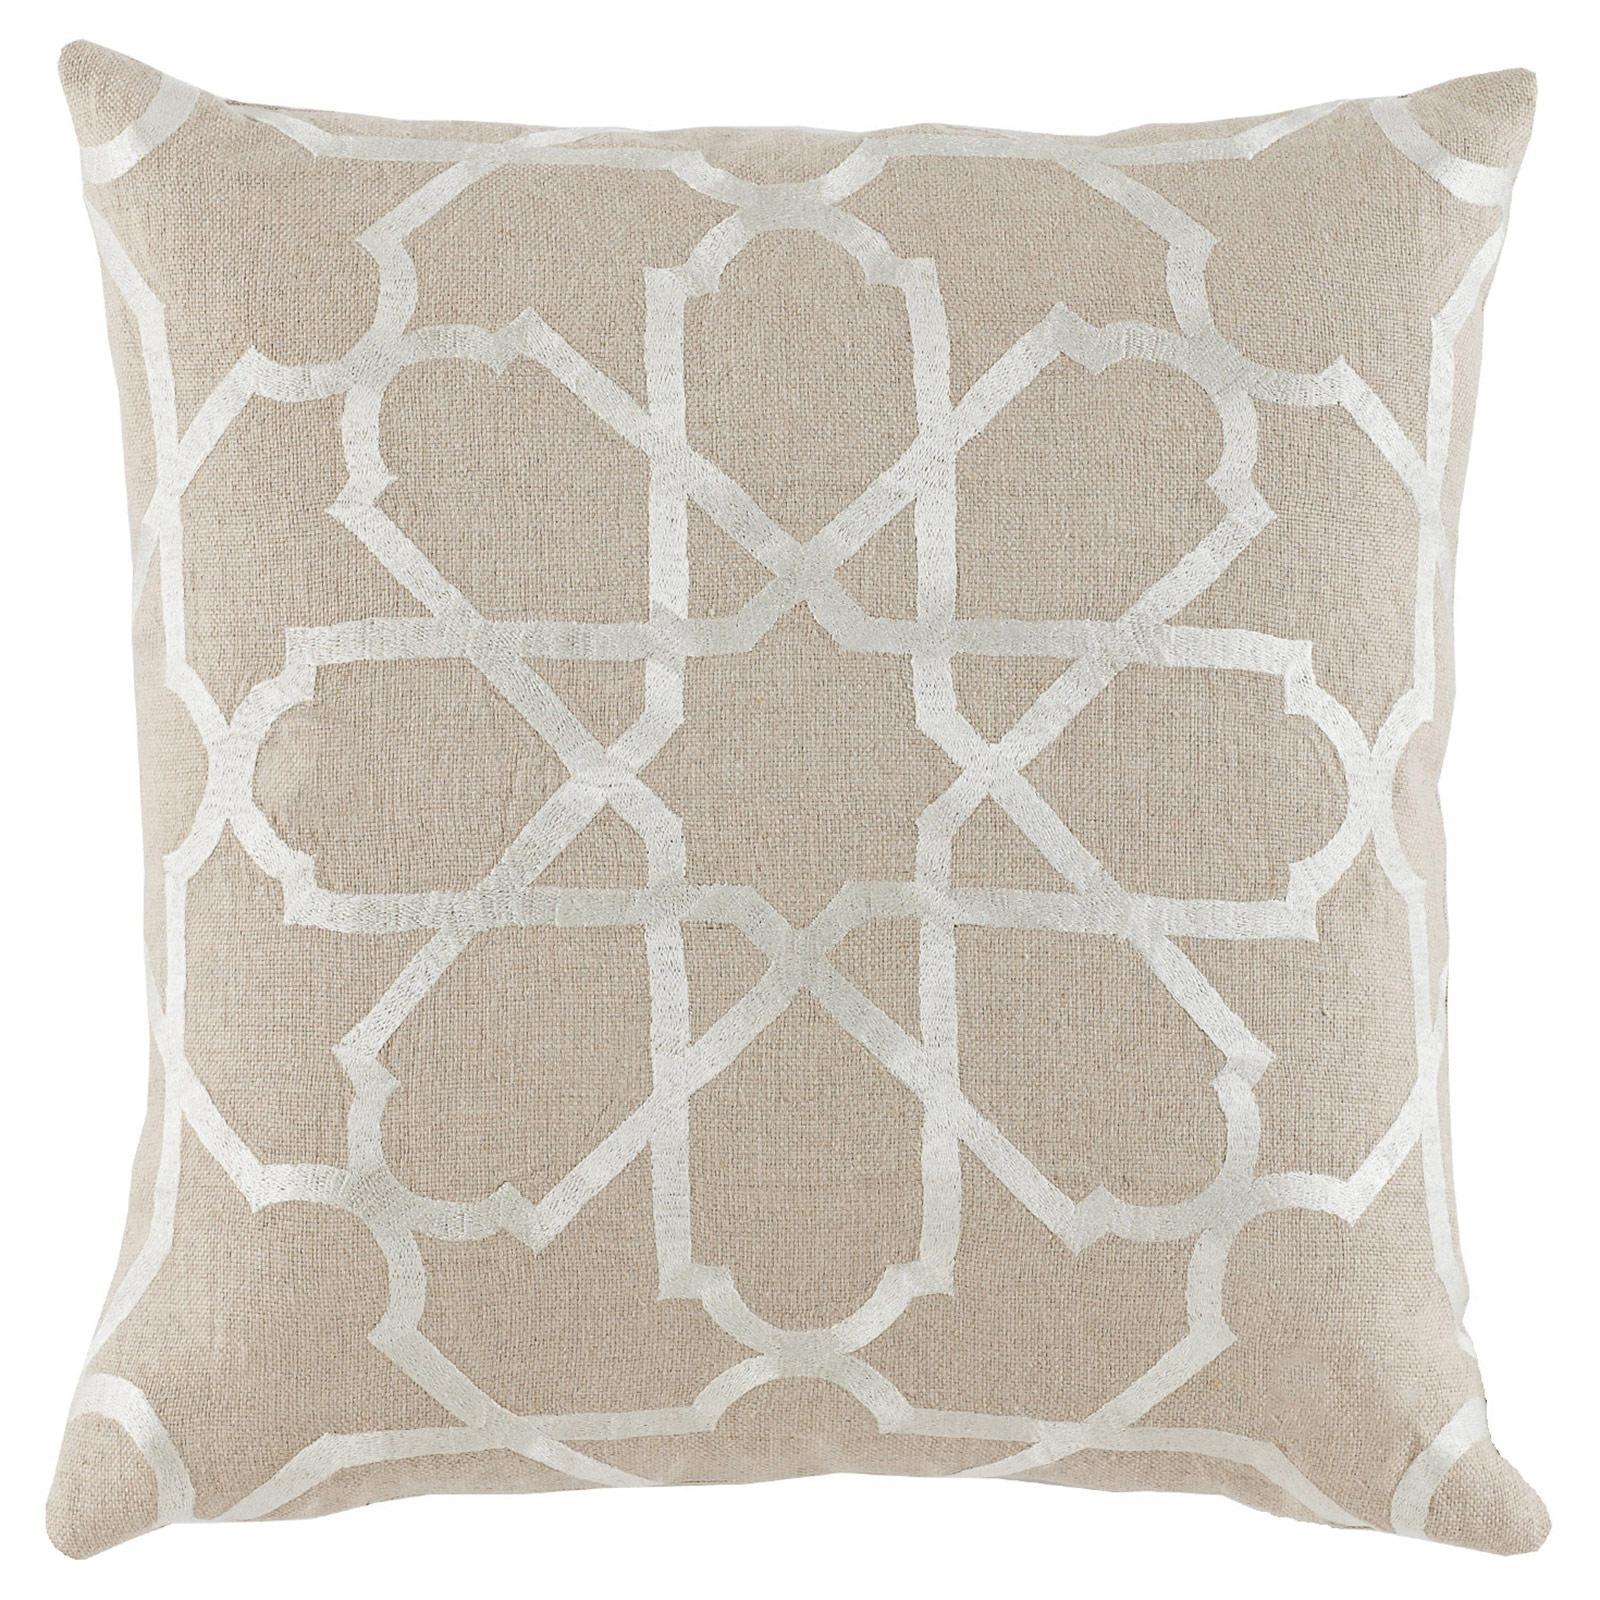 Emmet Modern Embroidered Ivory Tile Beige Pillow - 20x20